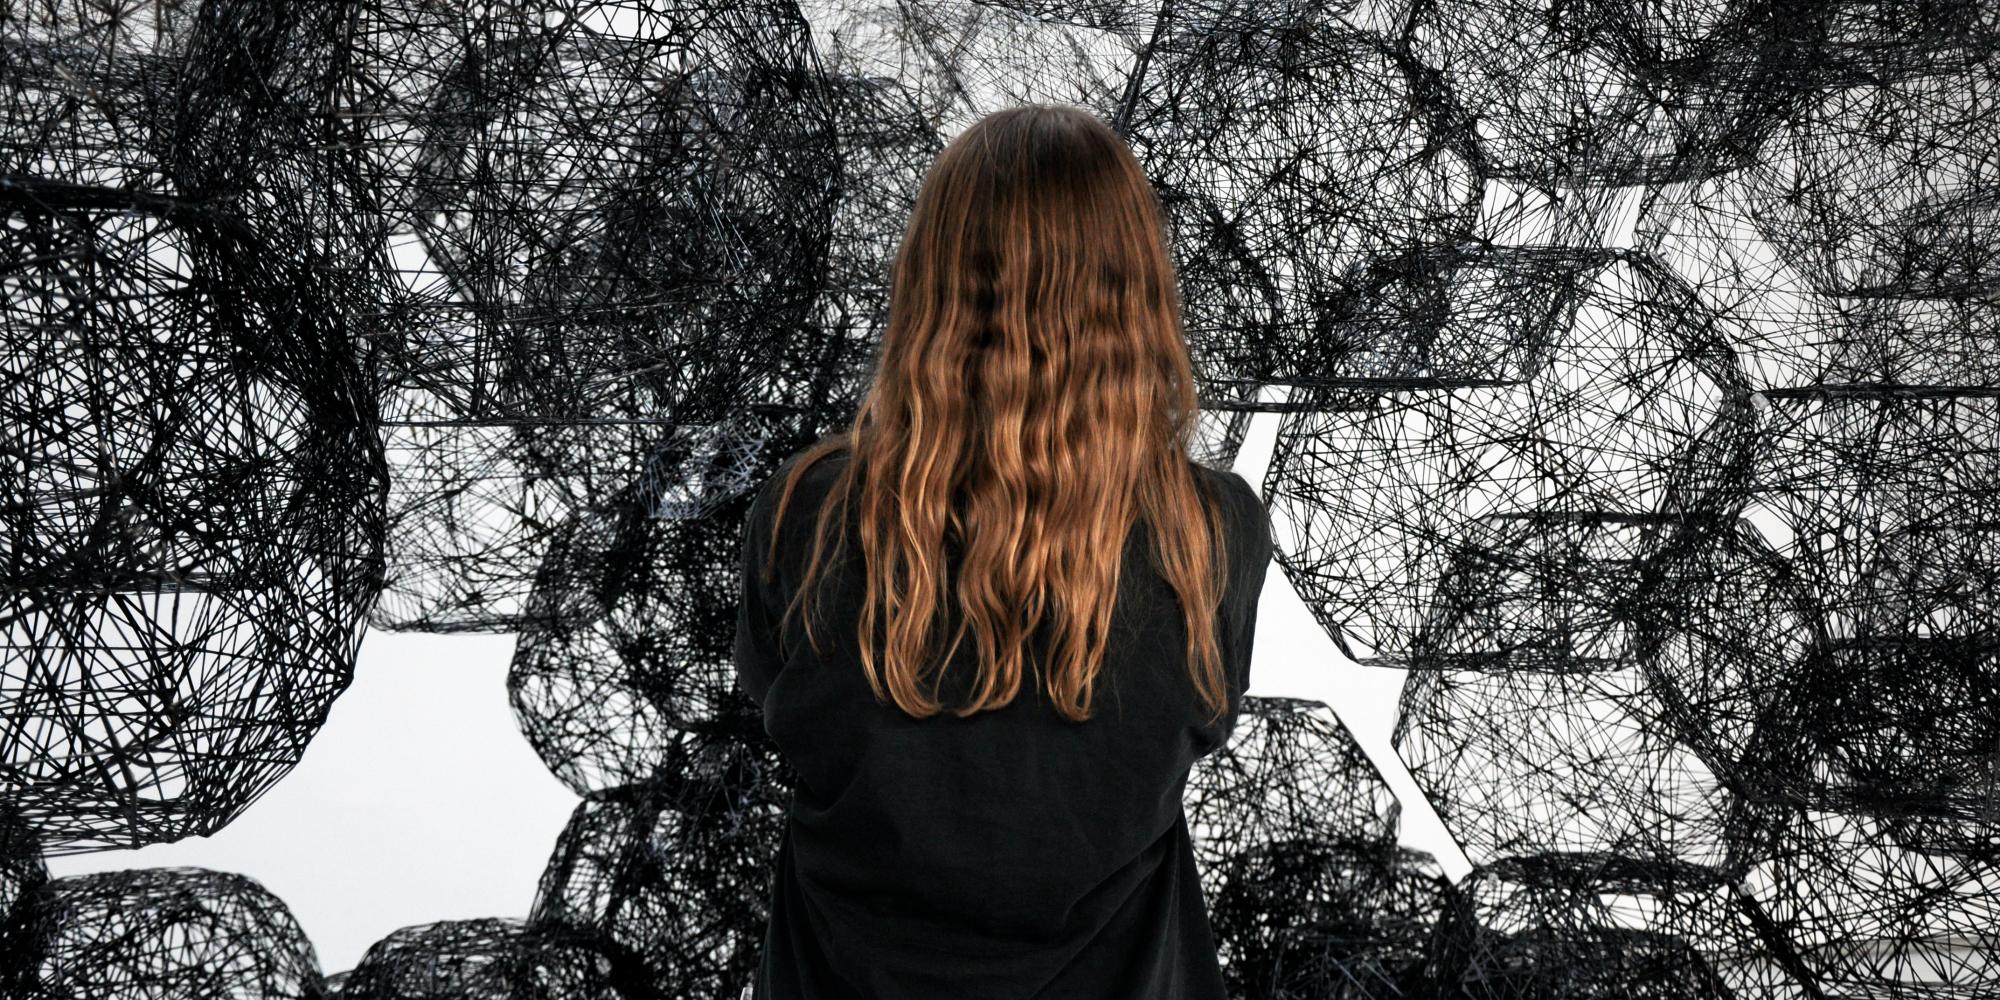 Foto Credit: Weissensee Kunsthochschule Berlin / Natascha Unger & Idalene Rapp